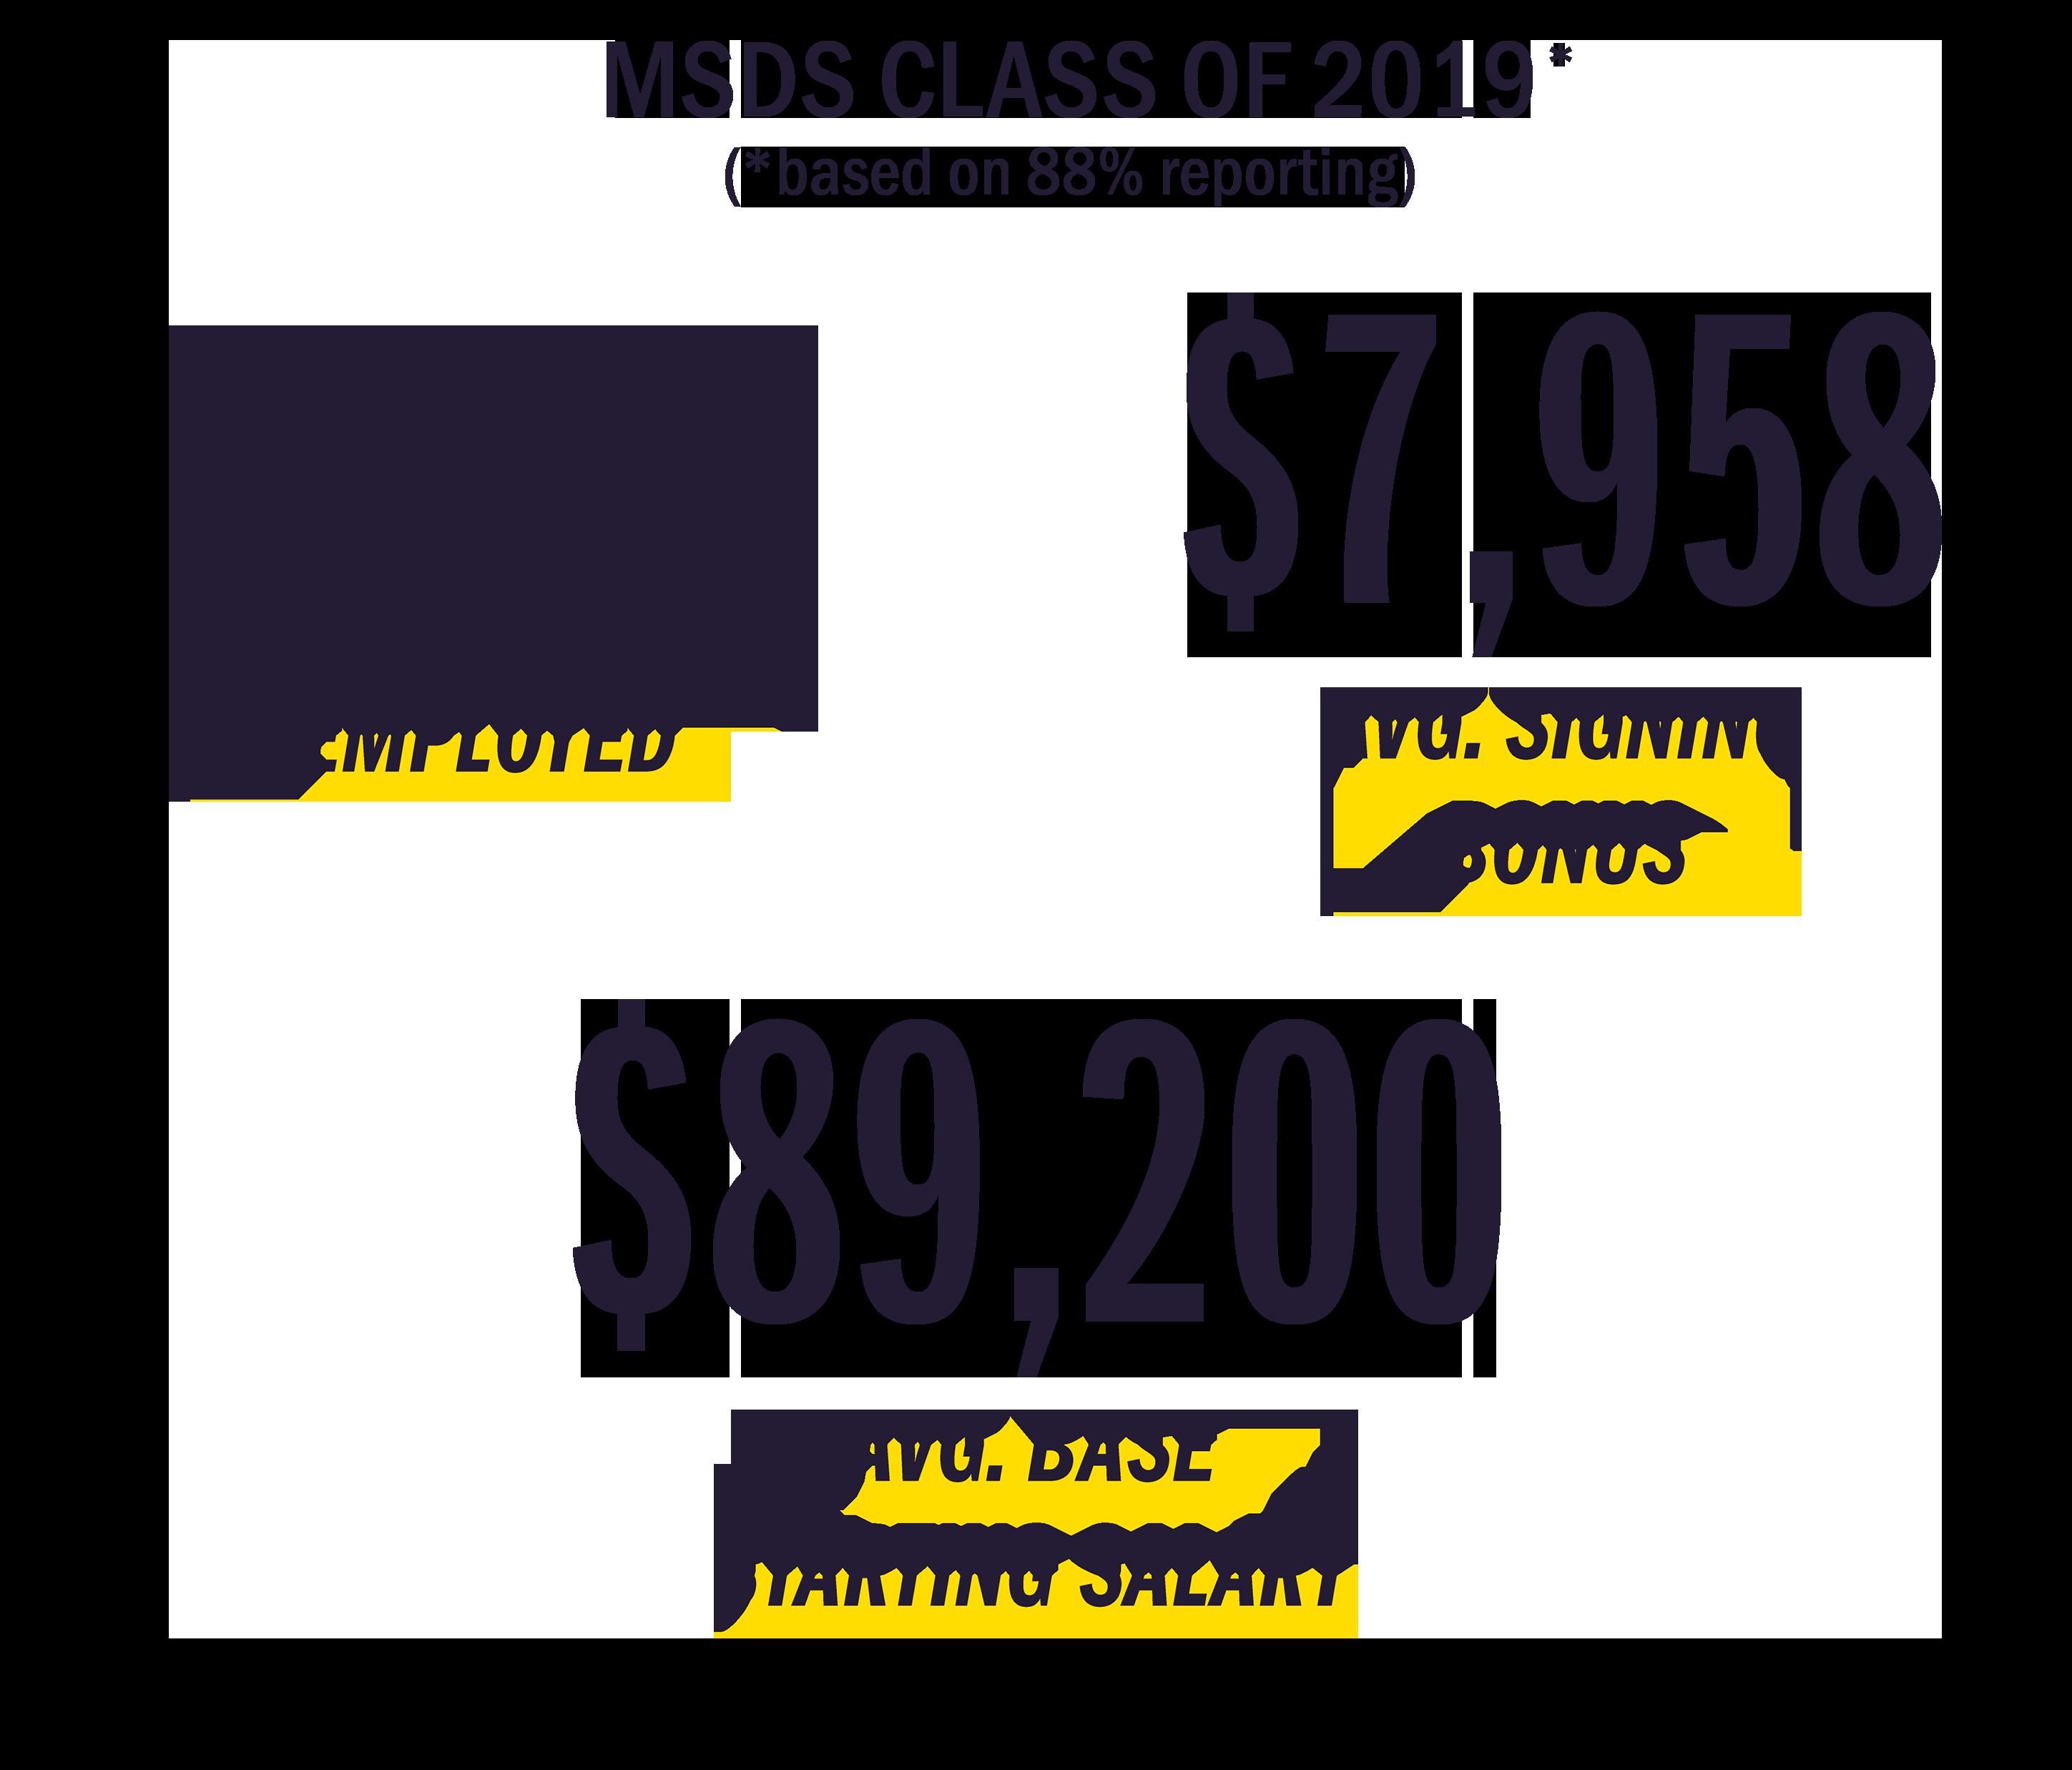 Image showing the MSDS 2019 Employment stats with 88 percent report. 100 percent employed, 7,958 average signing bonus, 89,200 average base starting salary.